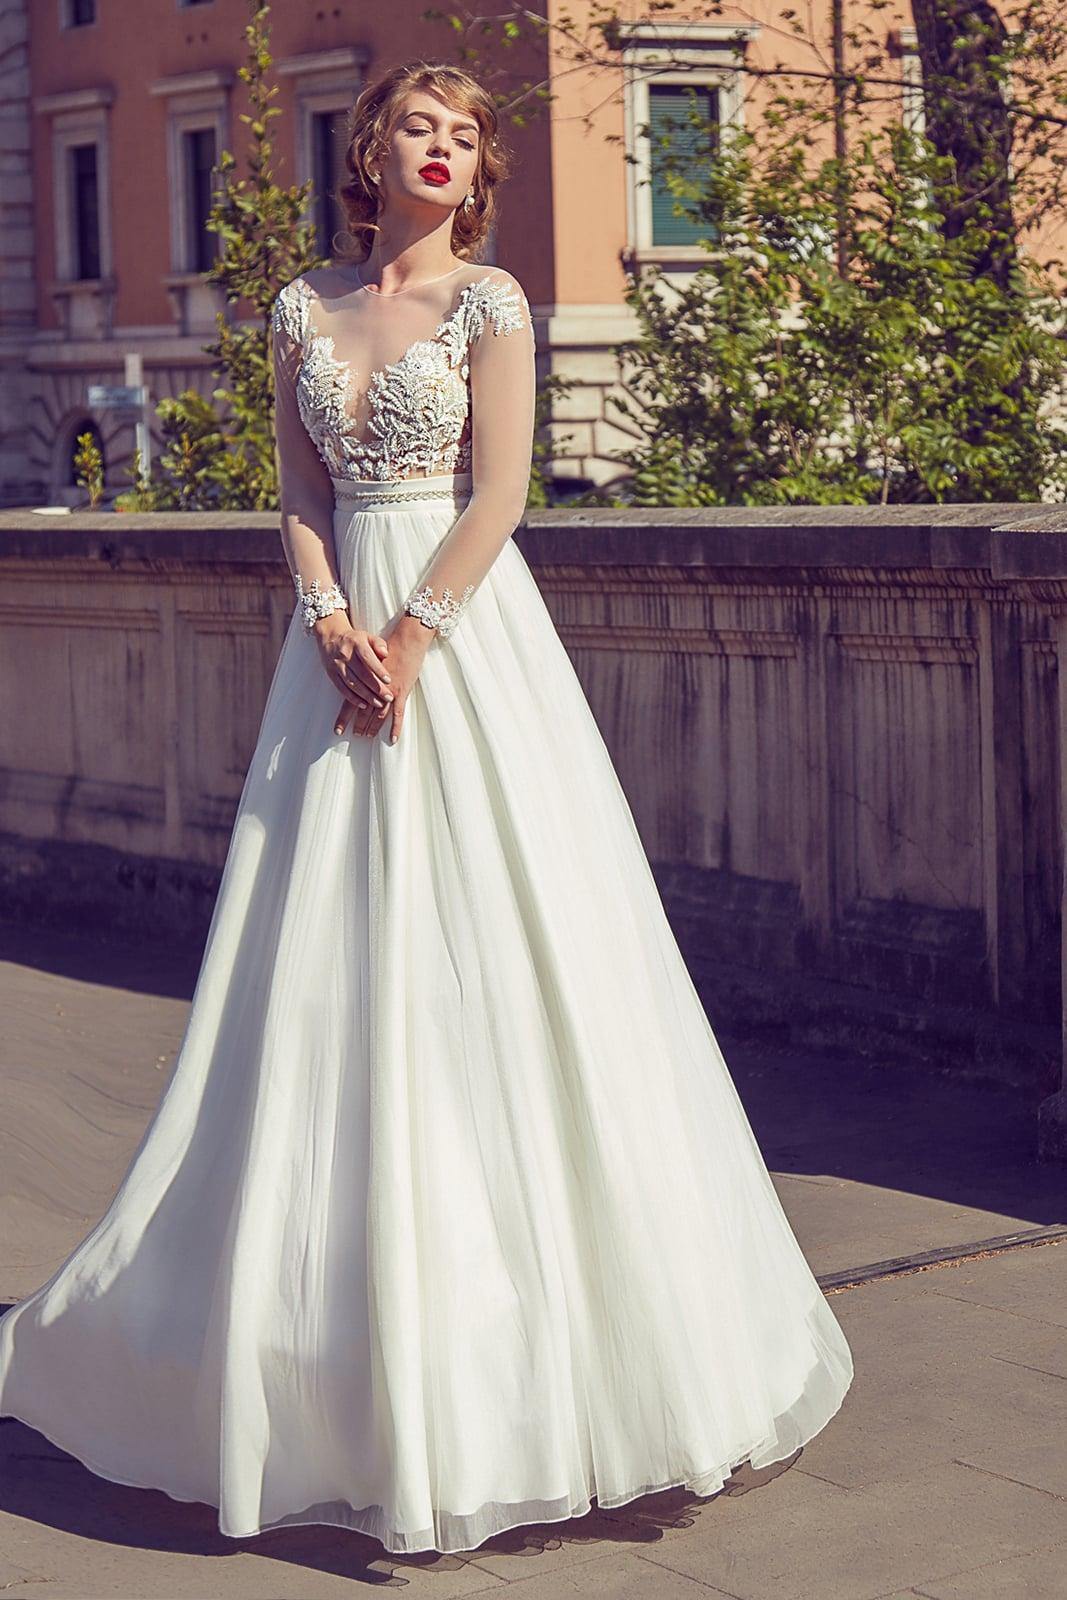 Neva Model - Colectia Roma - Adora Sposa